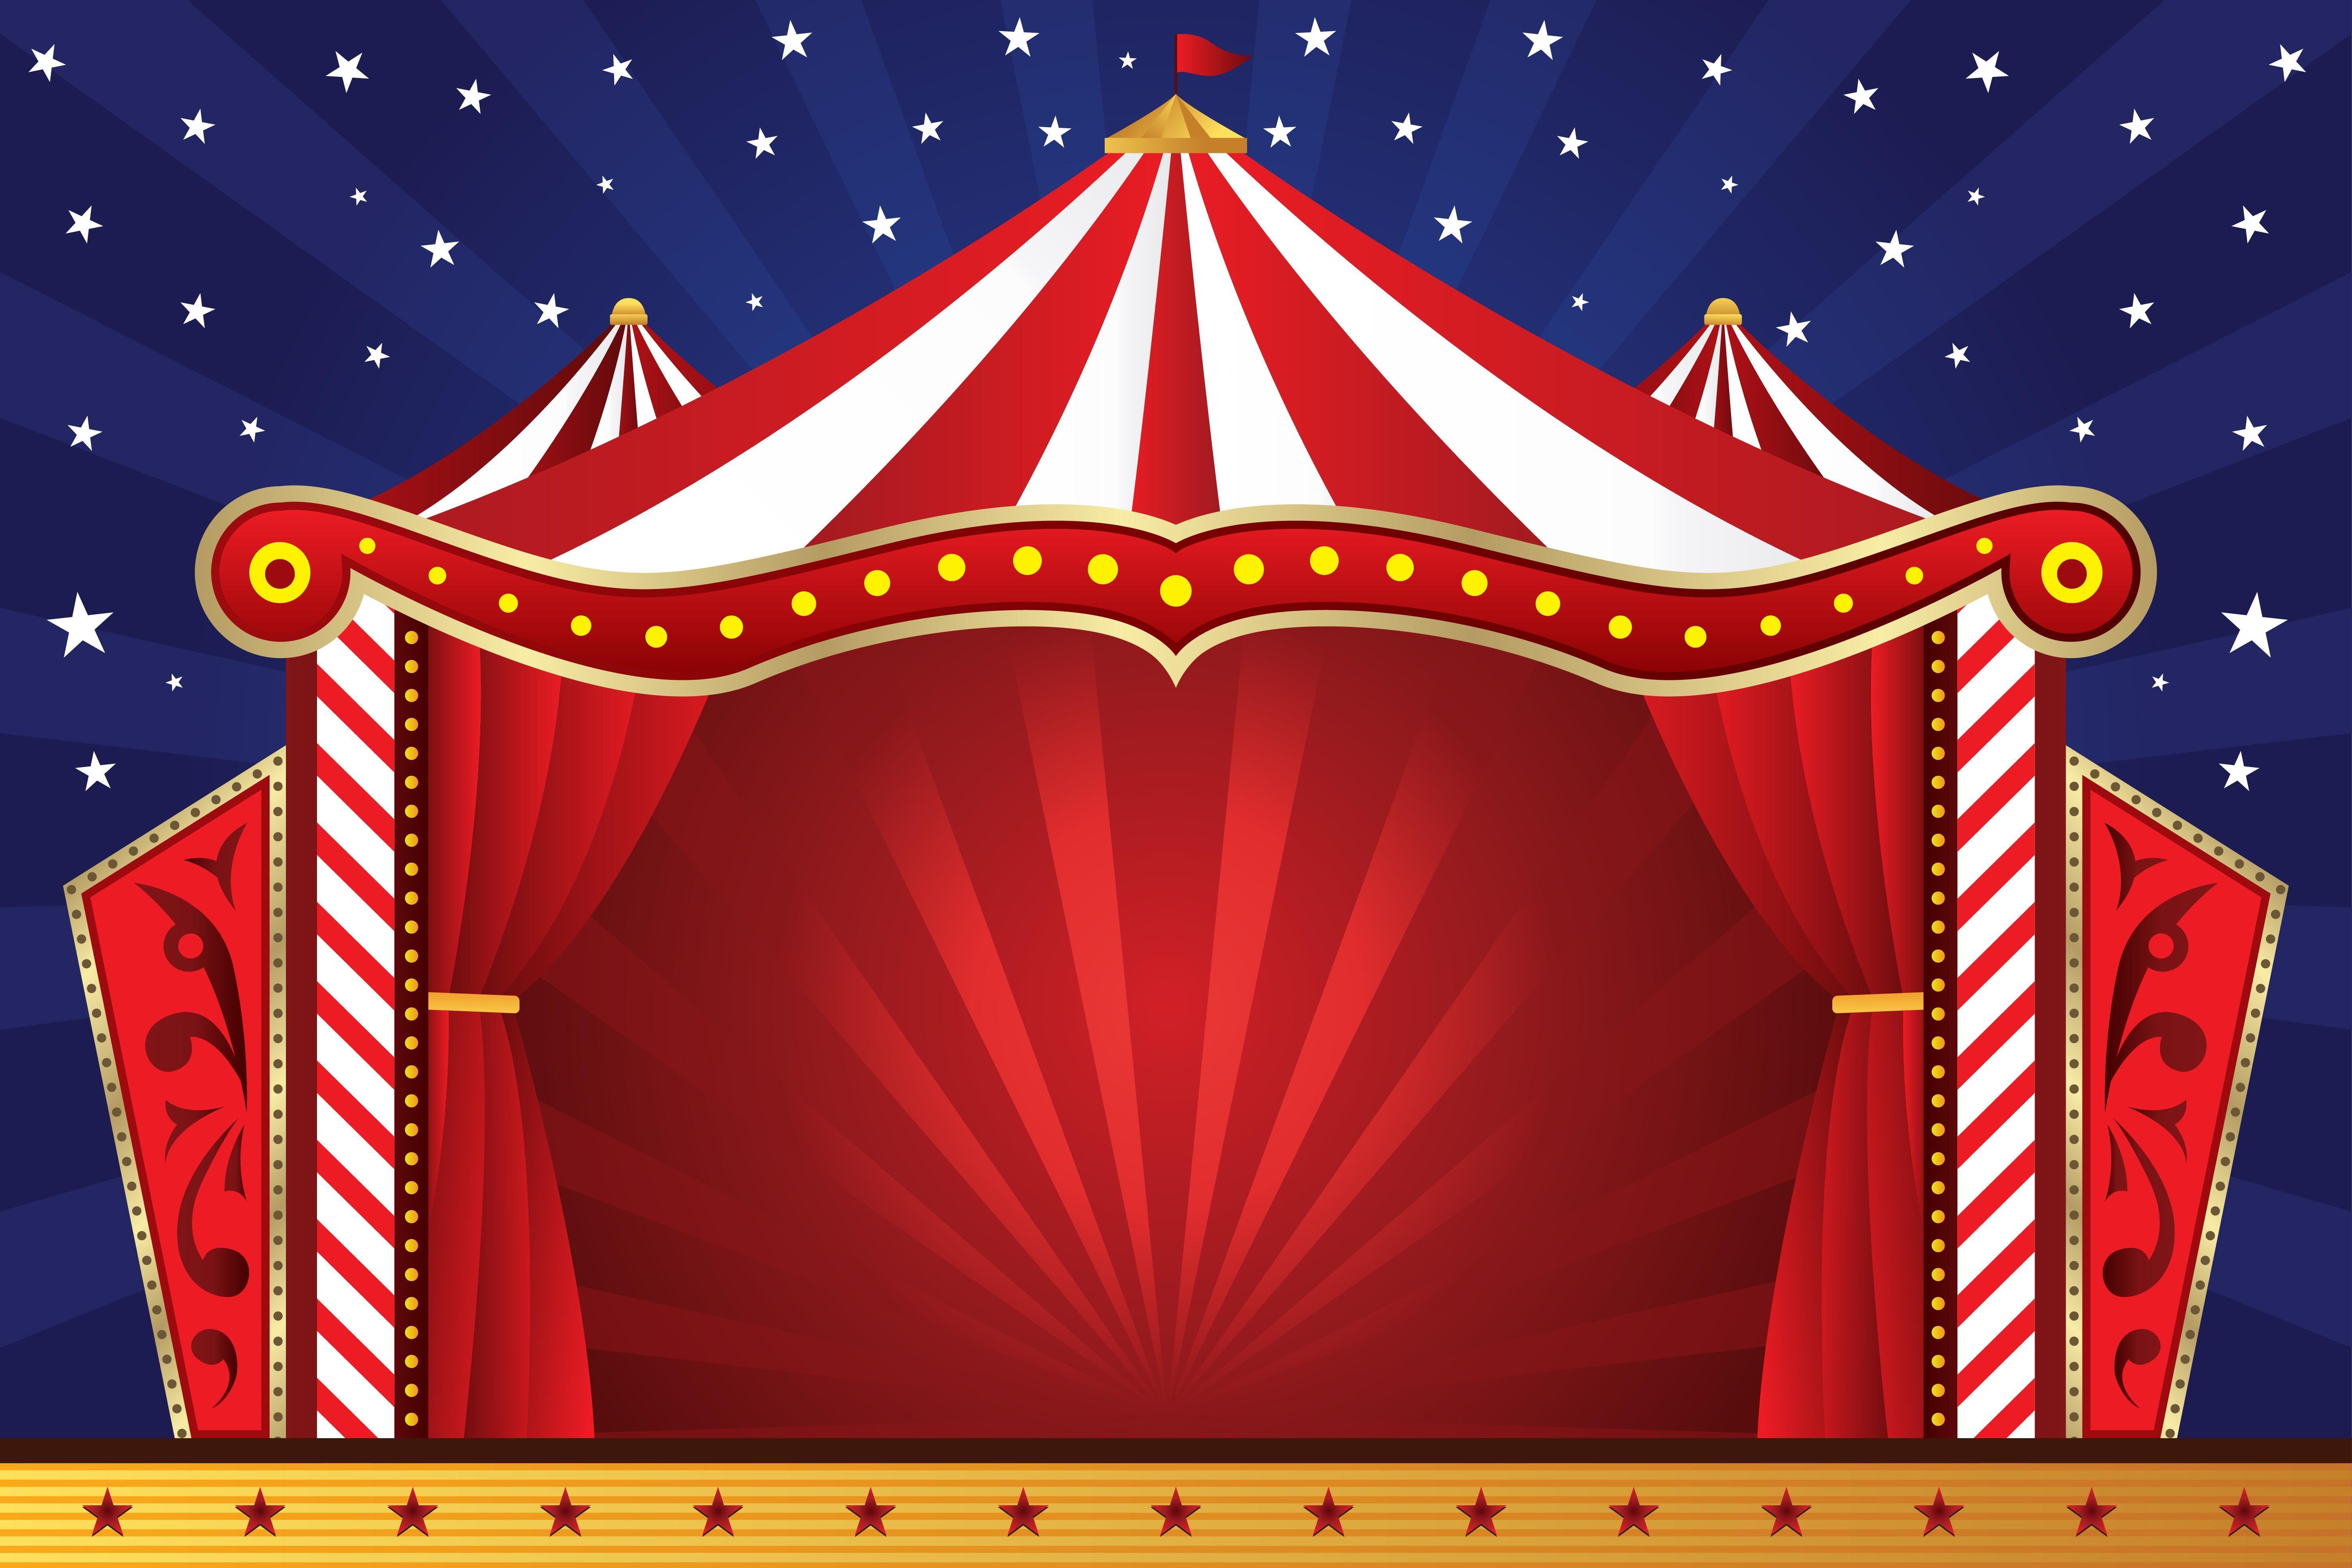 Circus Theme Wallpapers   Top Circus Theme Backgrounds 5906x3937